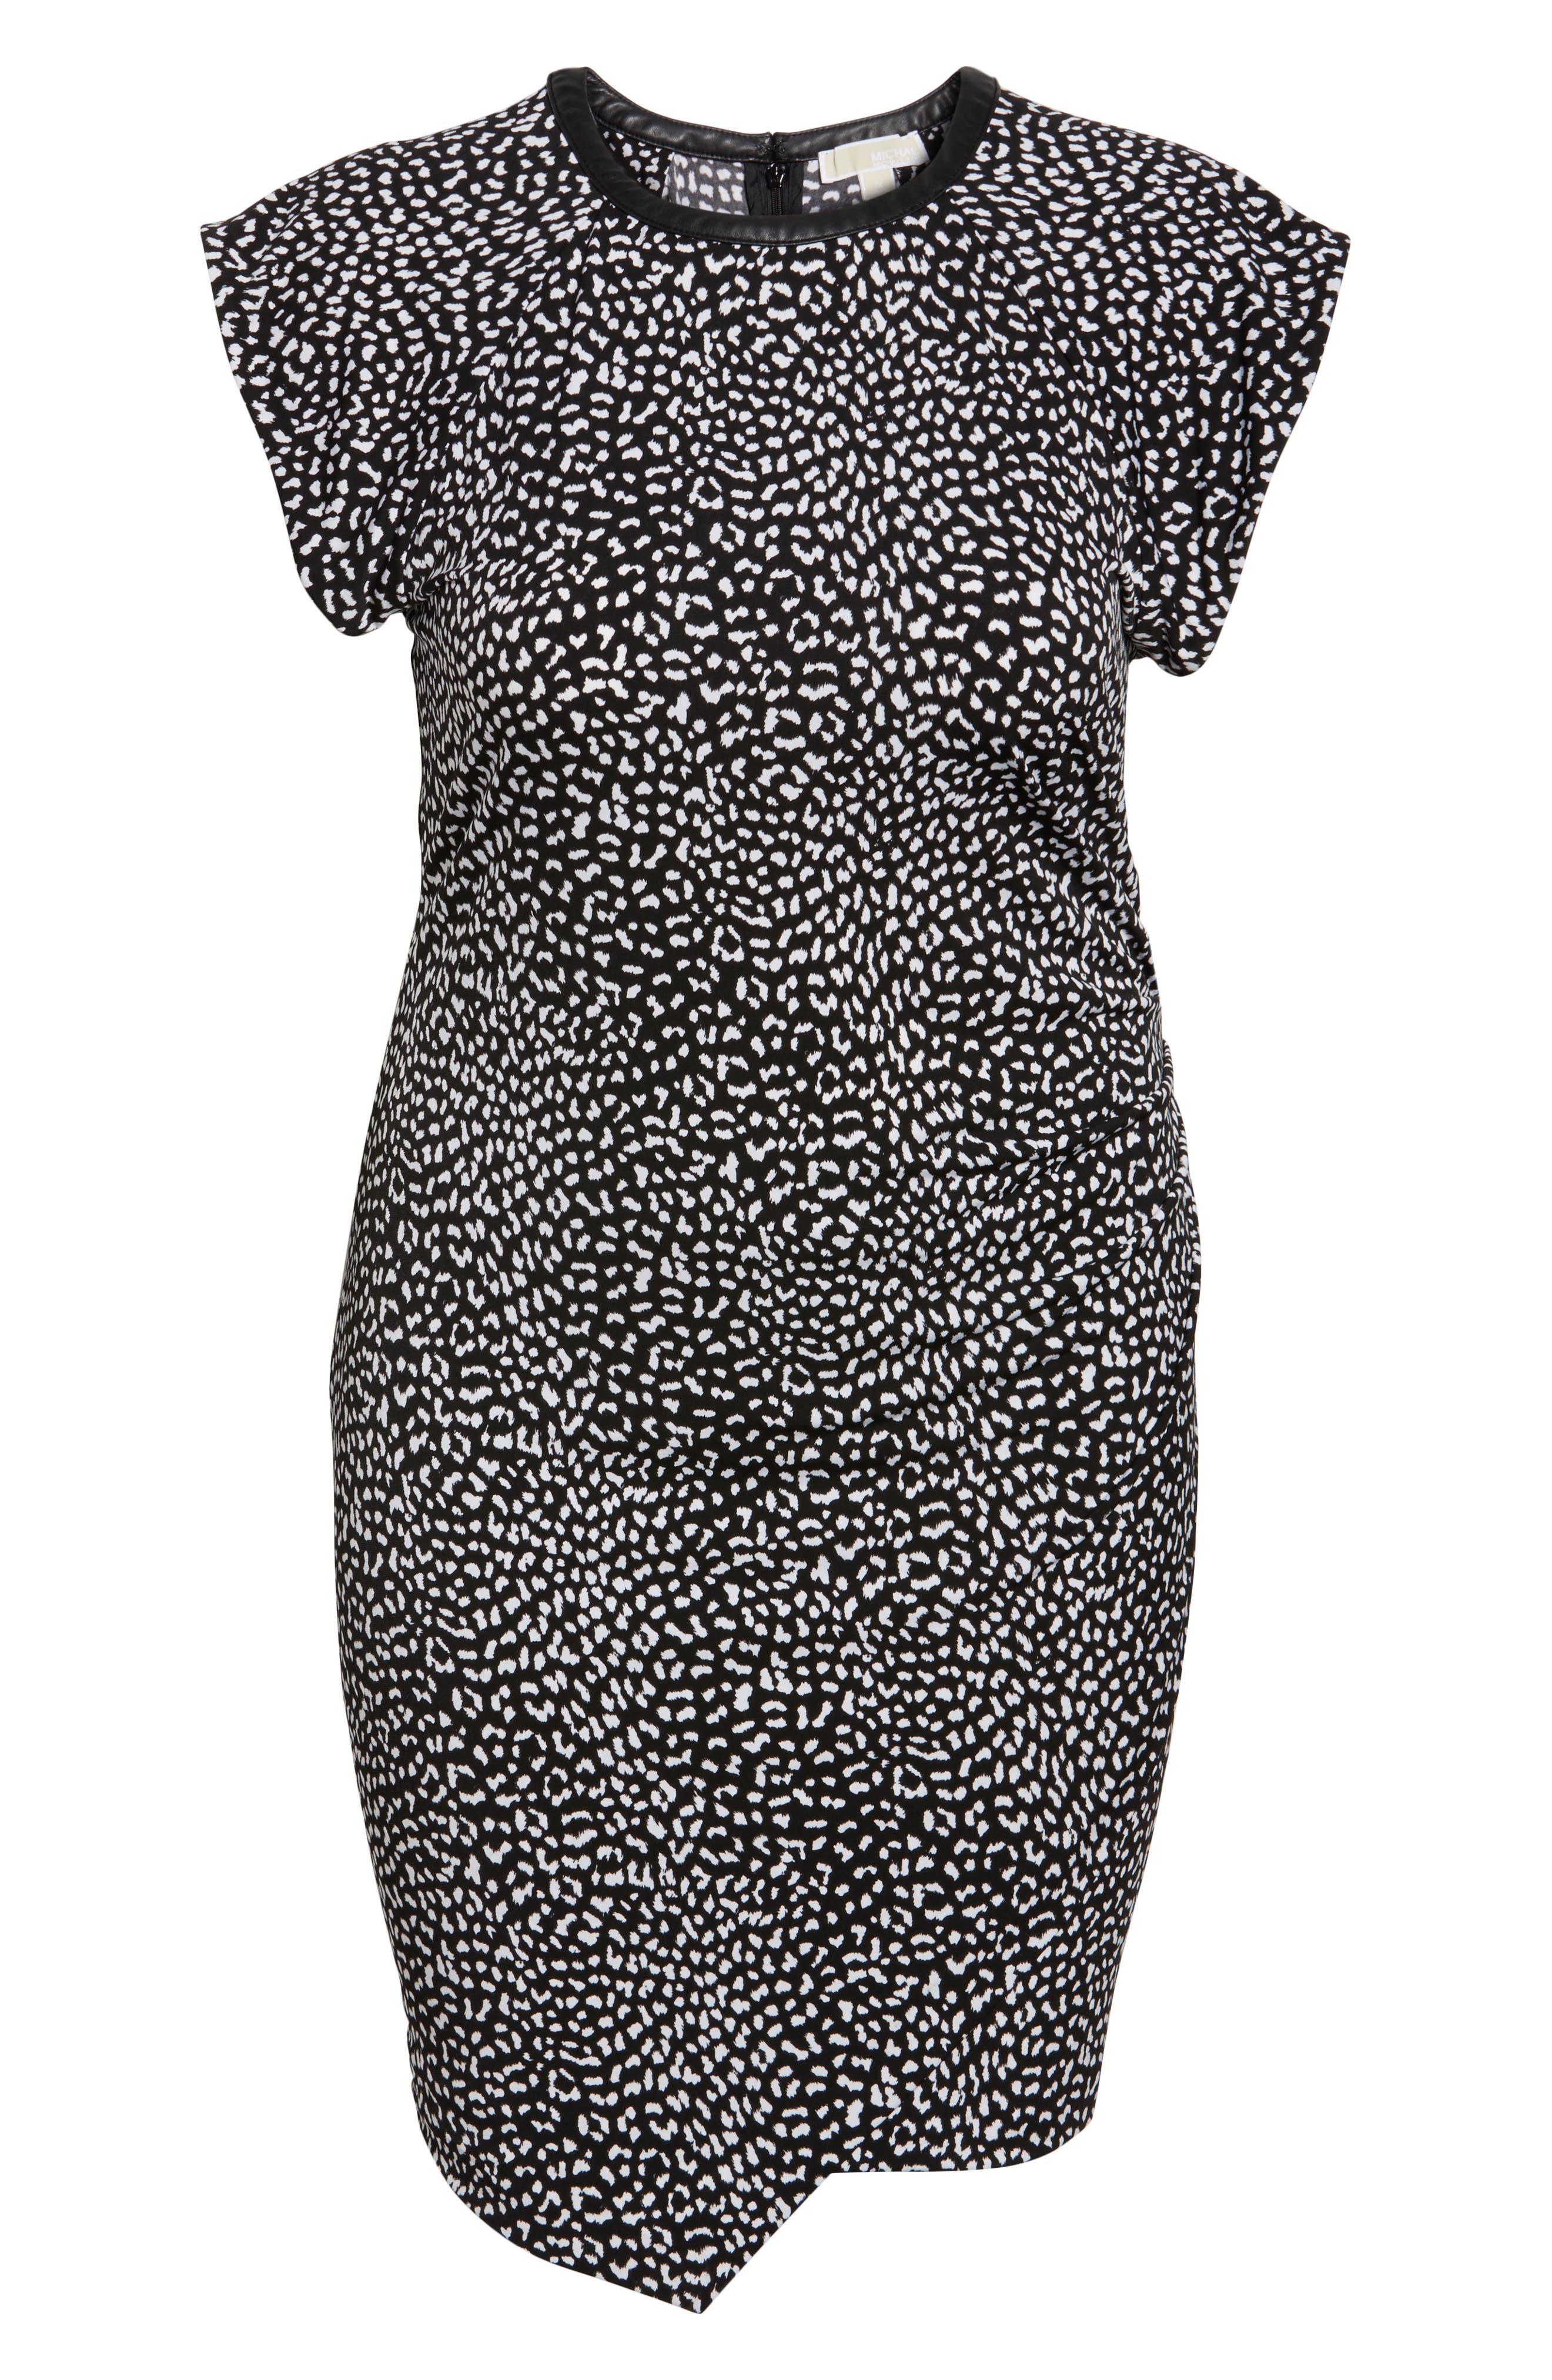 Cheetah Print Flutter Sleeve Dress,                             Alternate thumbnail 6, color,                             001